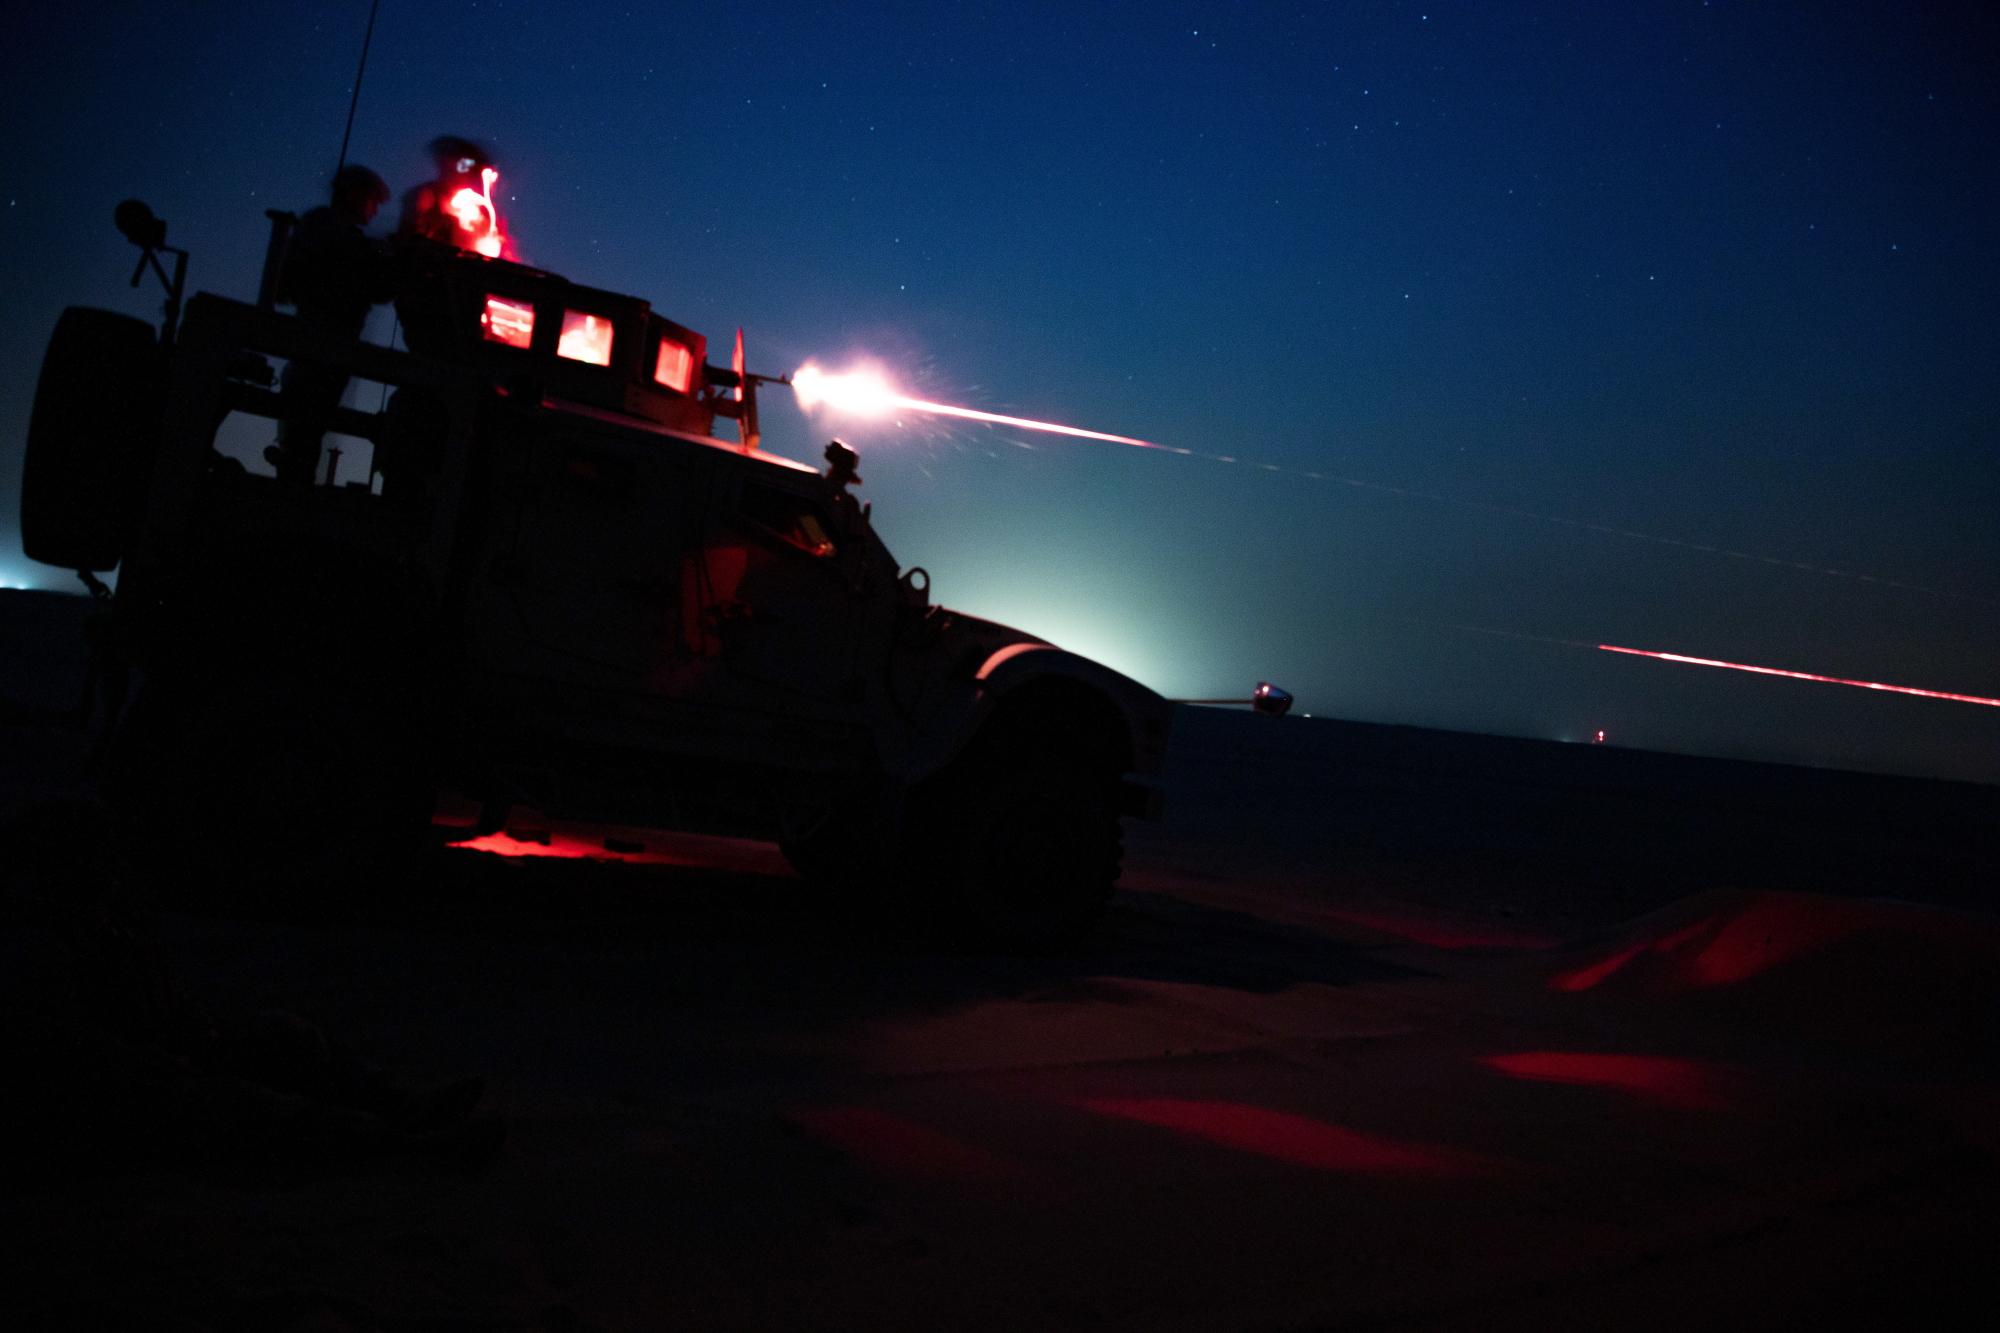 U.S. Marines fire an M240B from an MRAP All-Terrain Vehicle during night time machinegun range in Kuwait, June 16, 2020. (Cpl. Cutler Brice/Marine Corps)